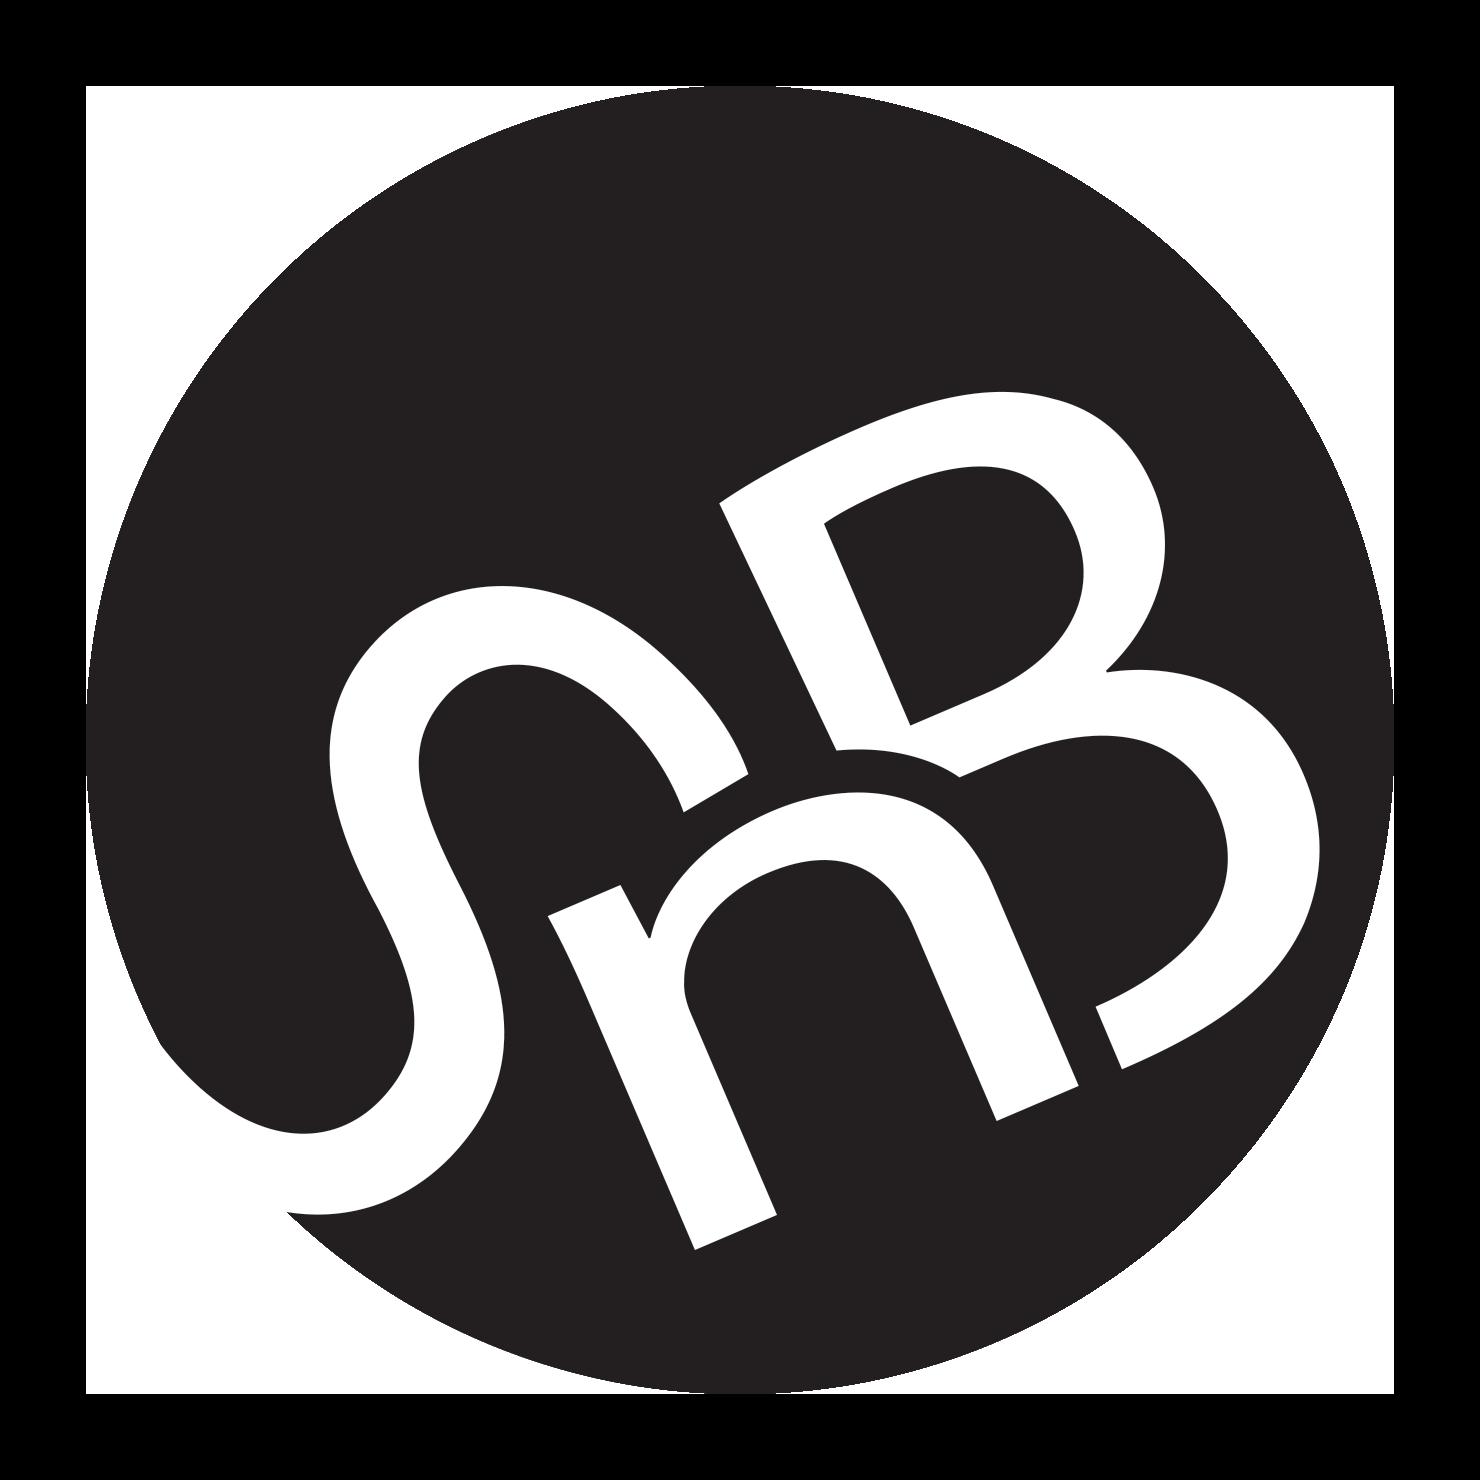 Sock 'n' Buskin Logo